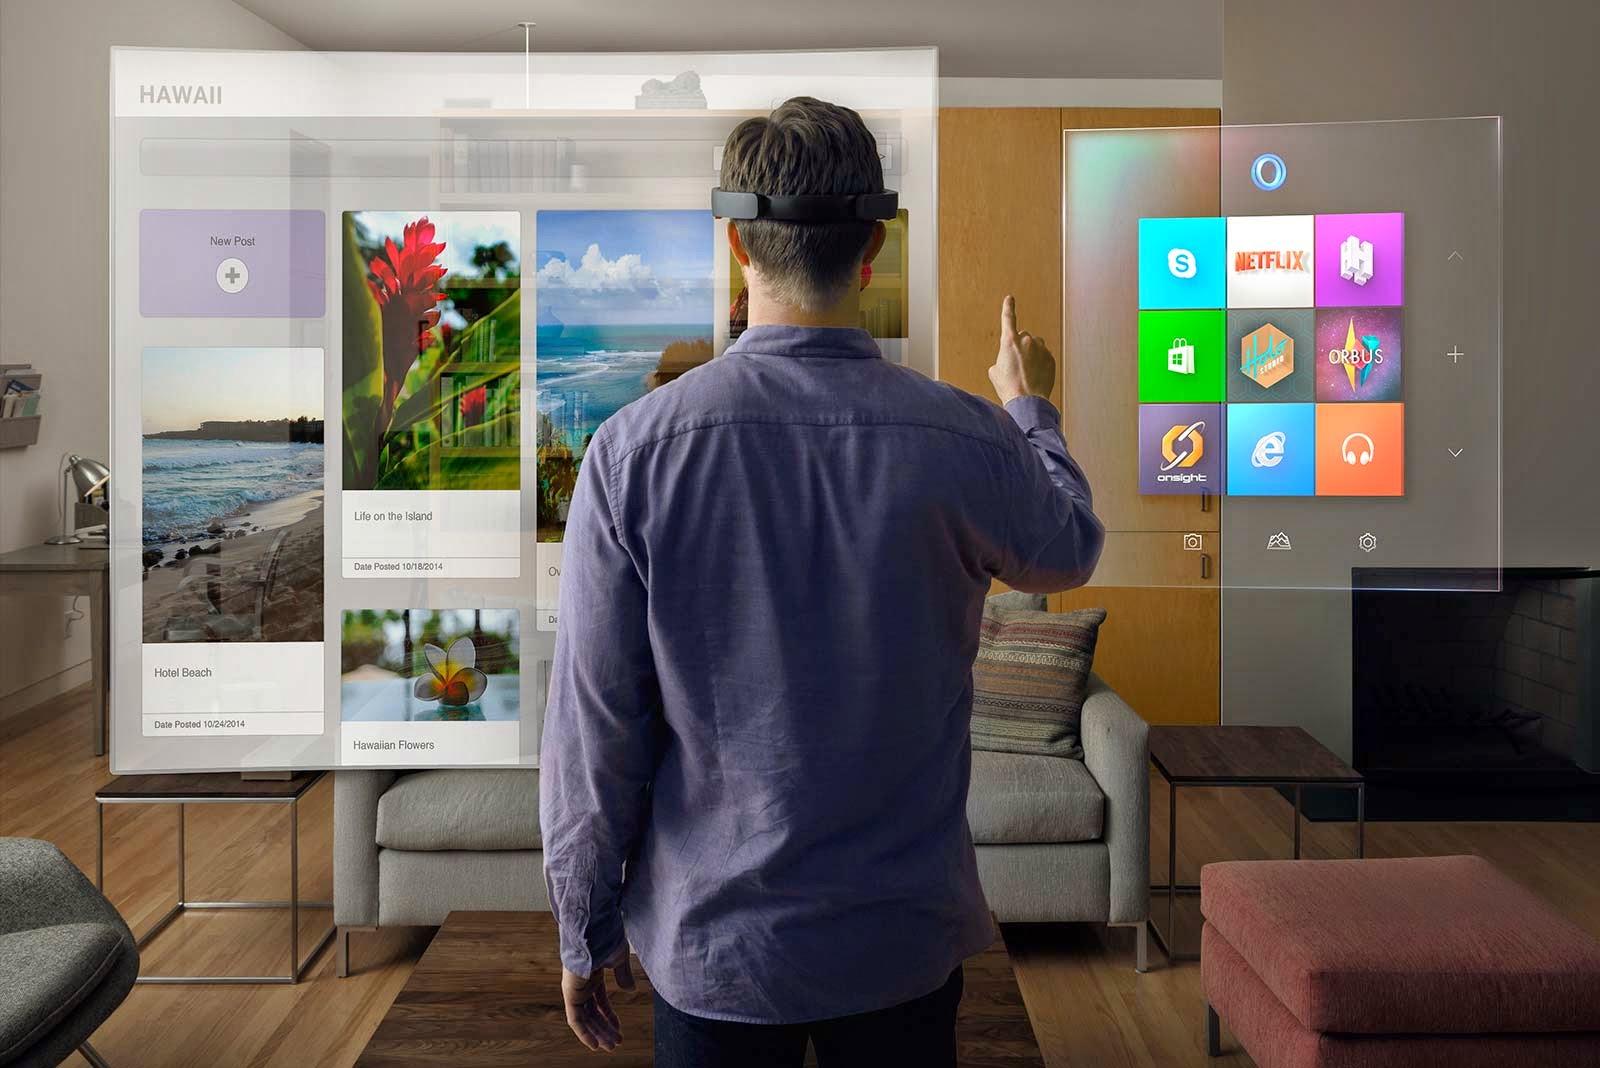 Windows 10 Hololens Virtual Reality